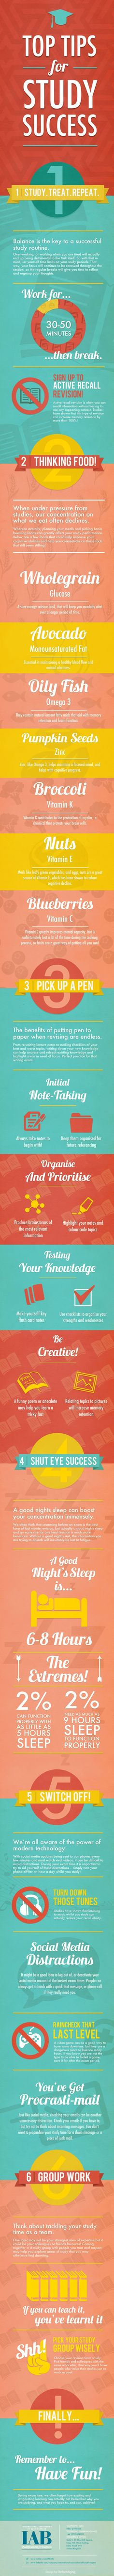 How to Form Good Study Habits. (original image via: iab.org.uk)